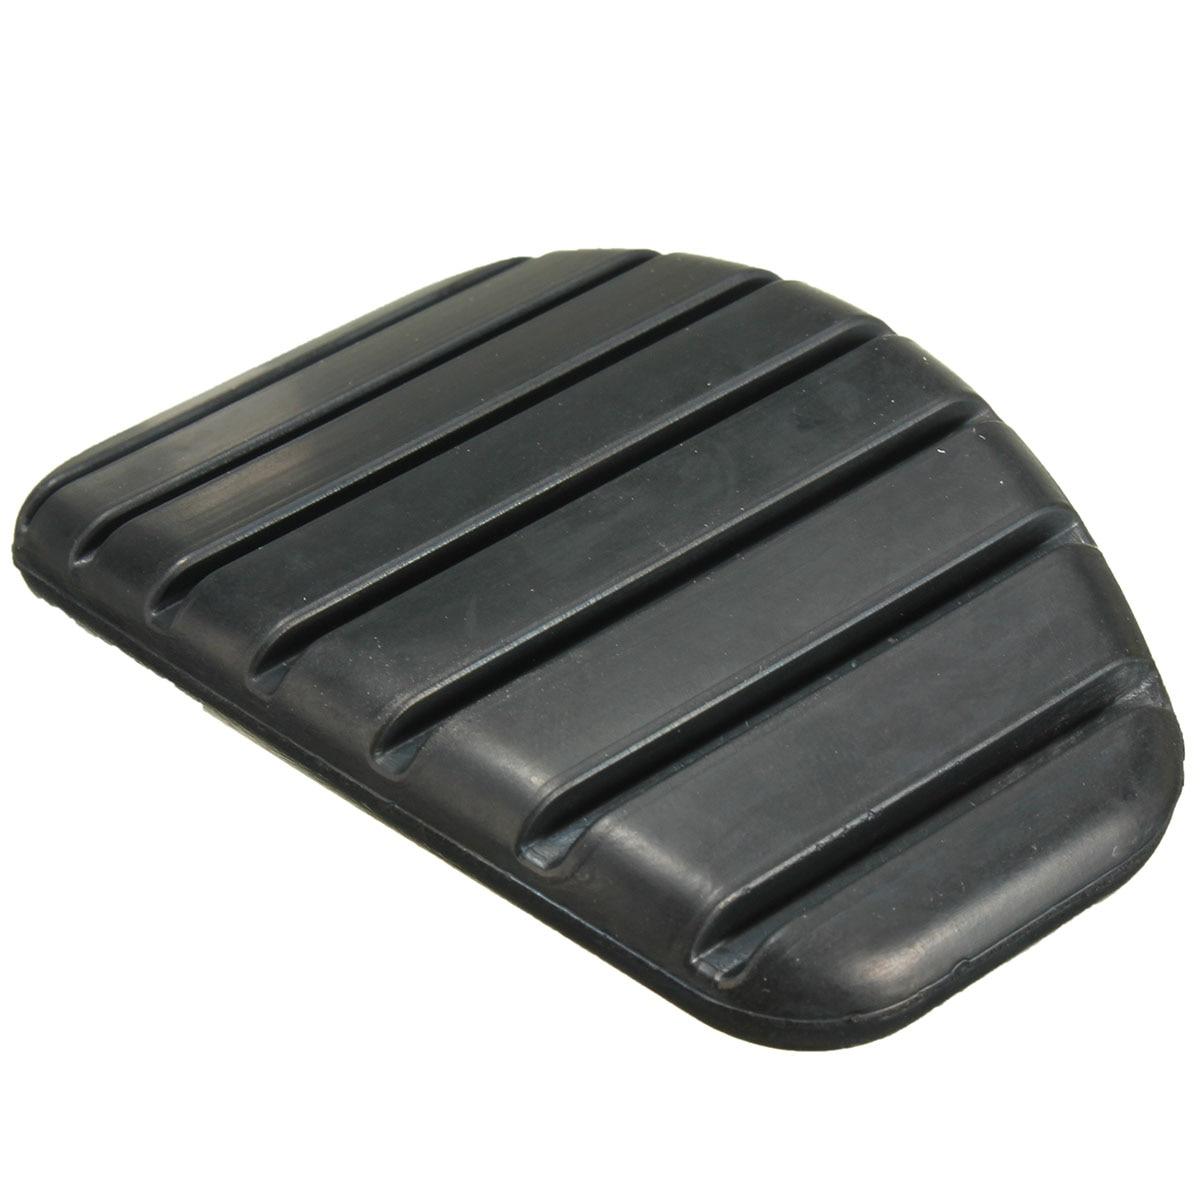 Carro auto universal preto borracha freio pedal de embreagem para renault clio ii kangoo megane ii